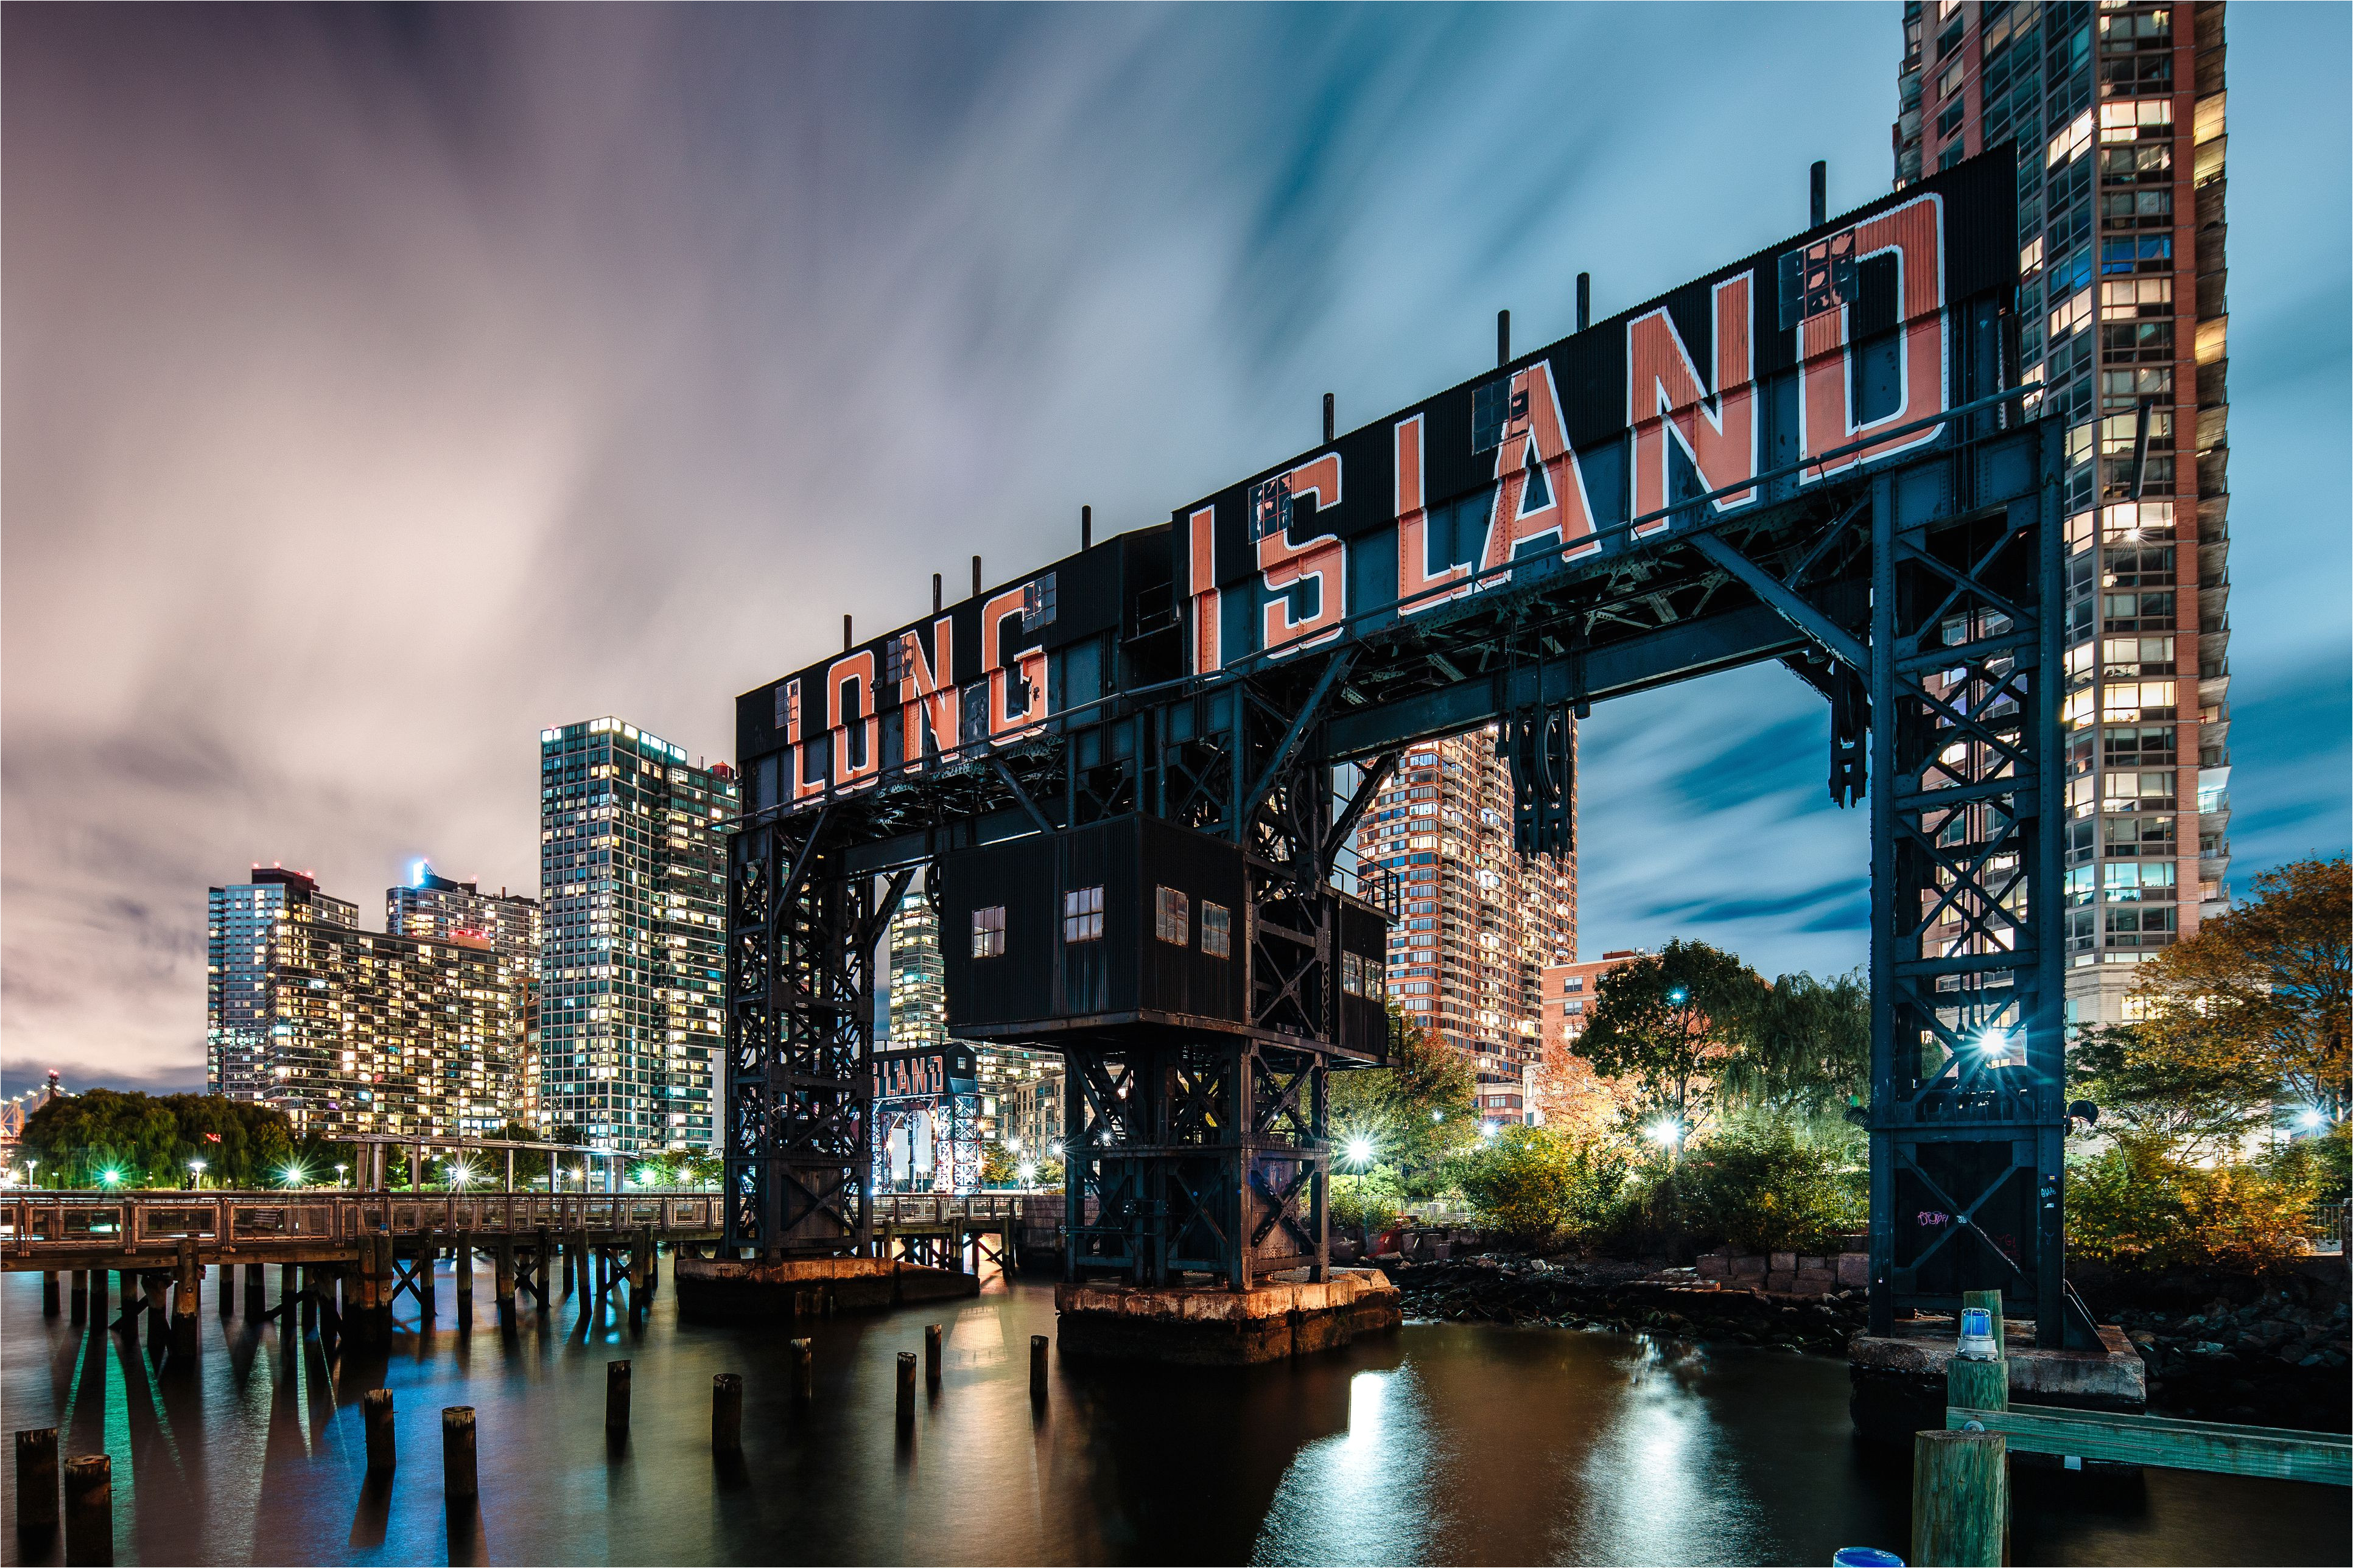 long island city gantry plaza park at night 945259244 5b91ab5c46e0fb00502d43ce jpg